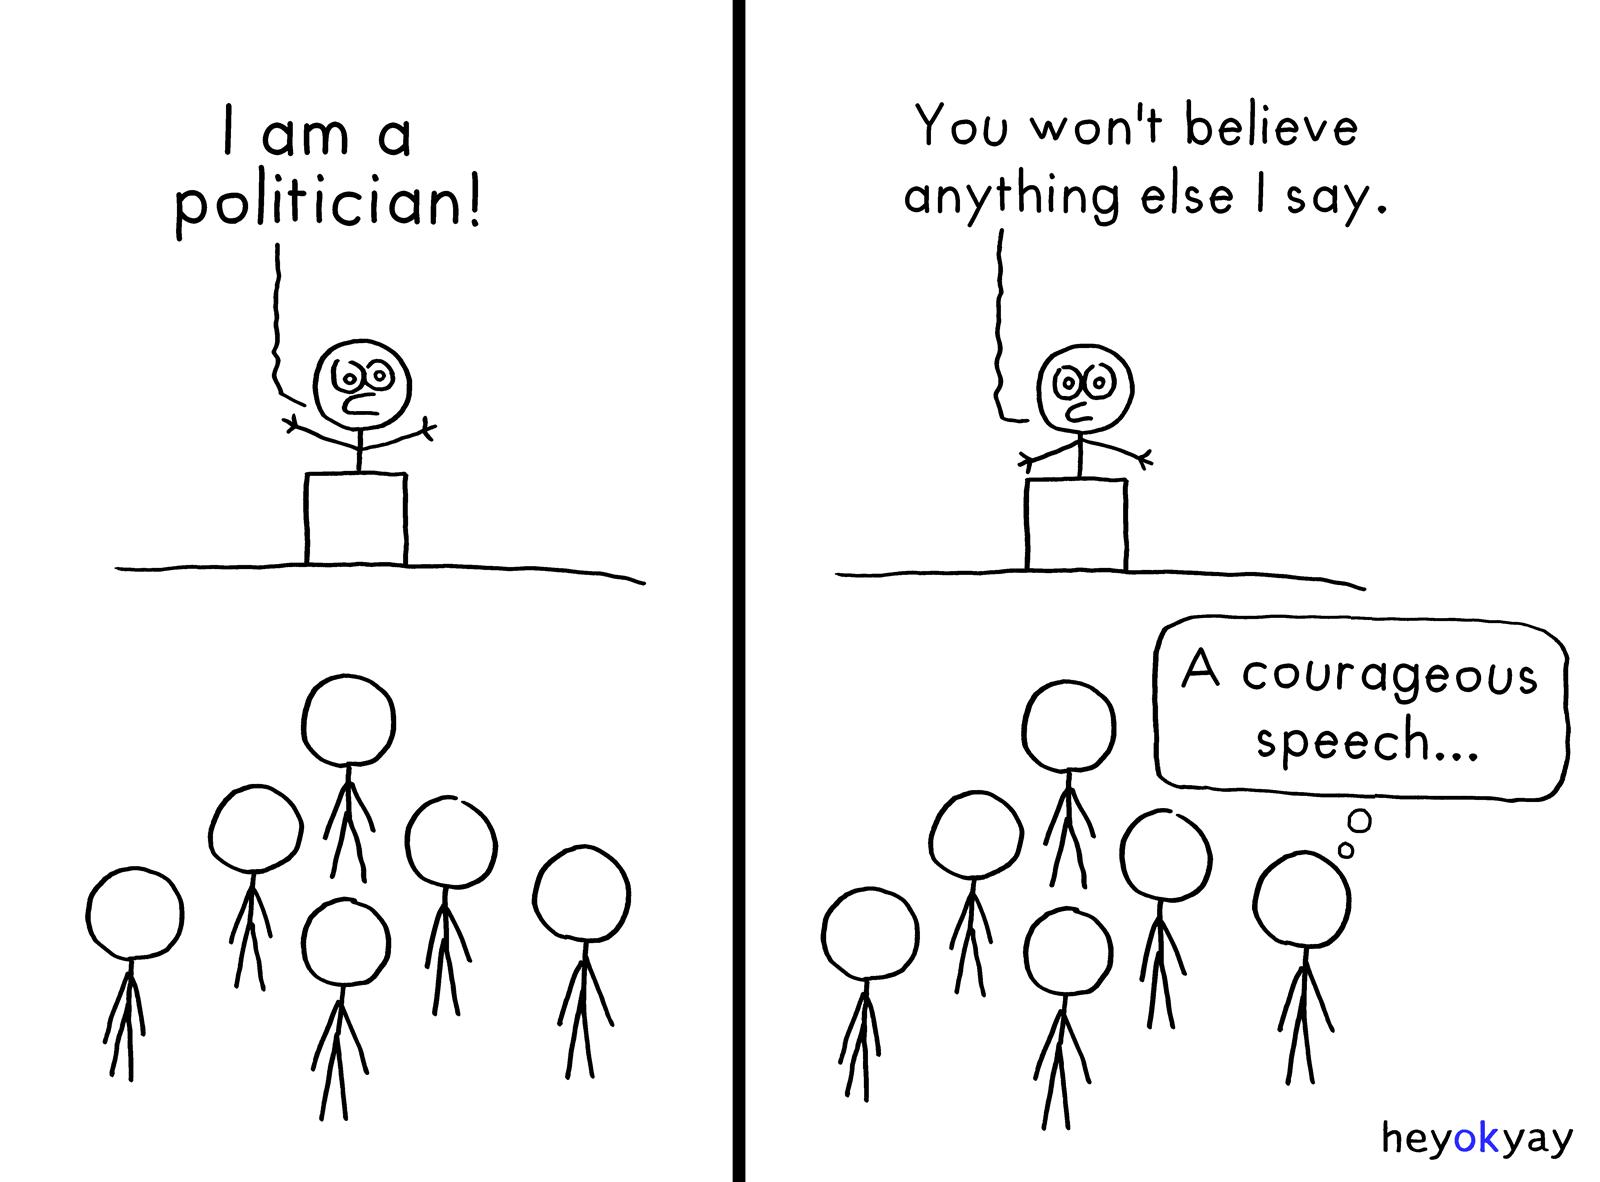 Speech heyokyay comic